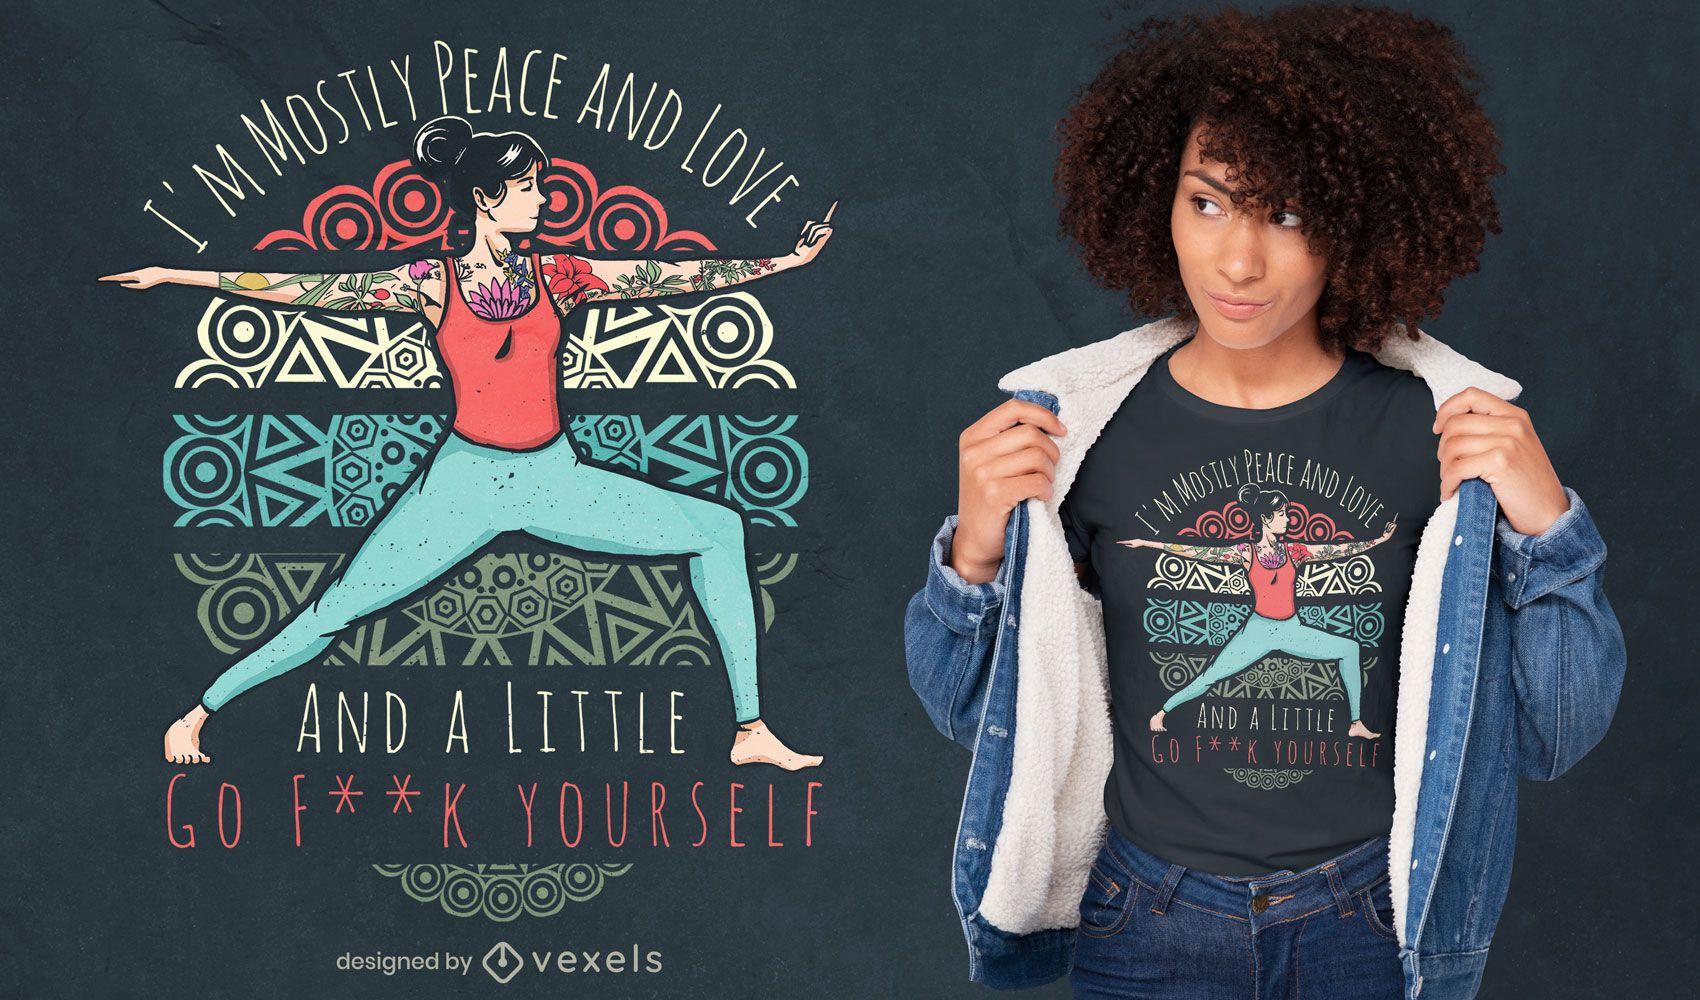 Yoga sassy quote t-shirt design